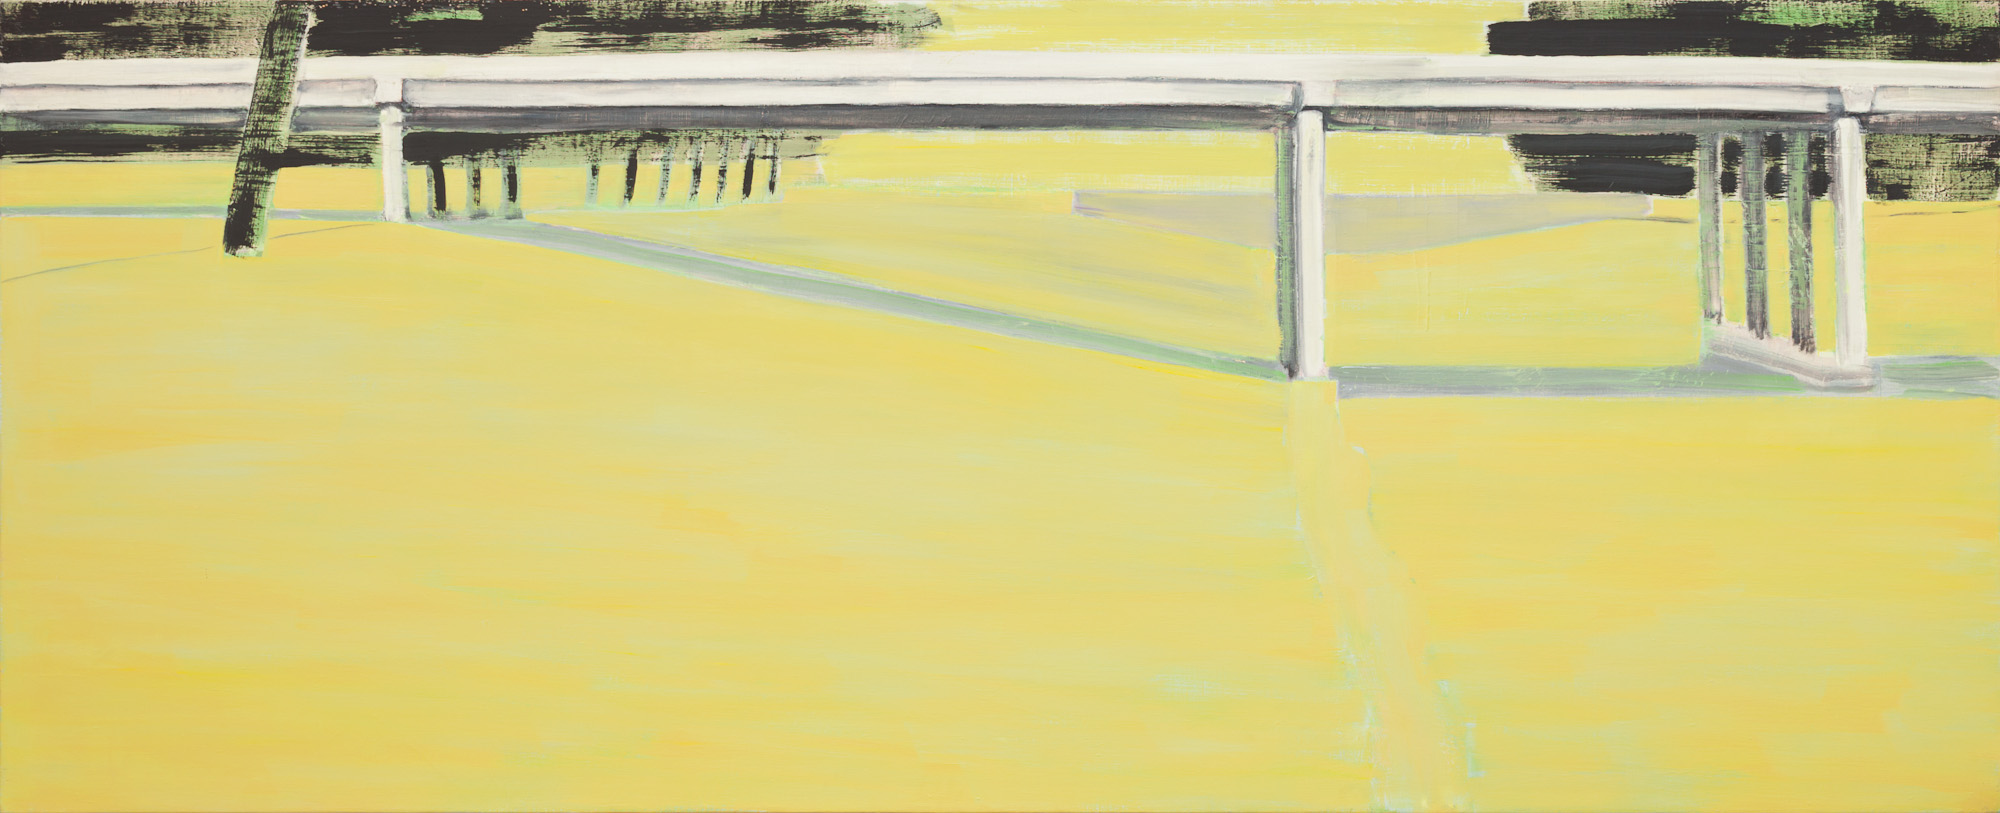 Crime scene, olieverf op linnen, 320 x 130 cm, Nico Bakker